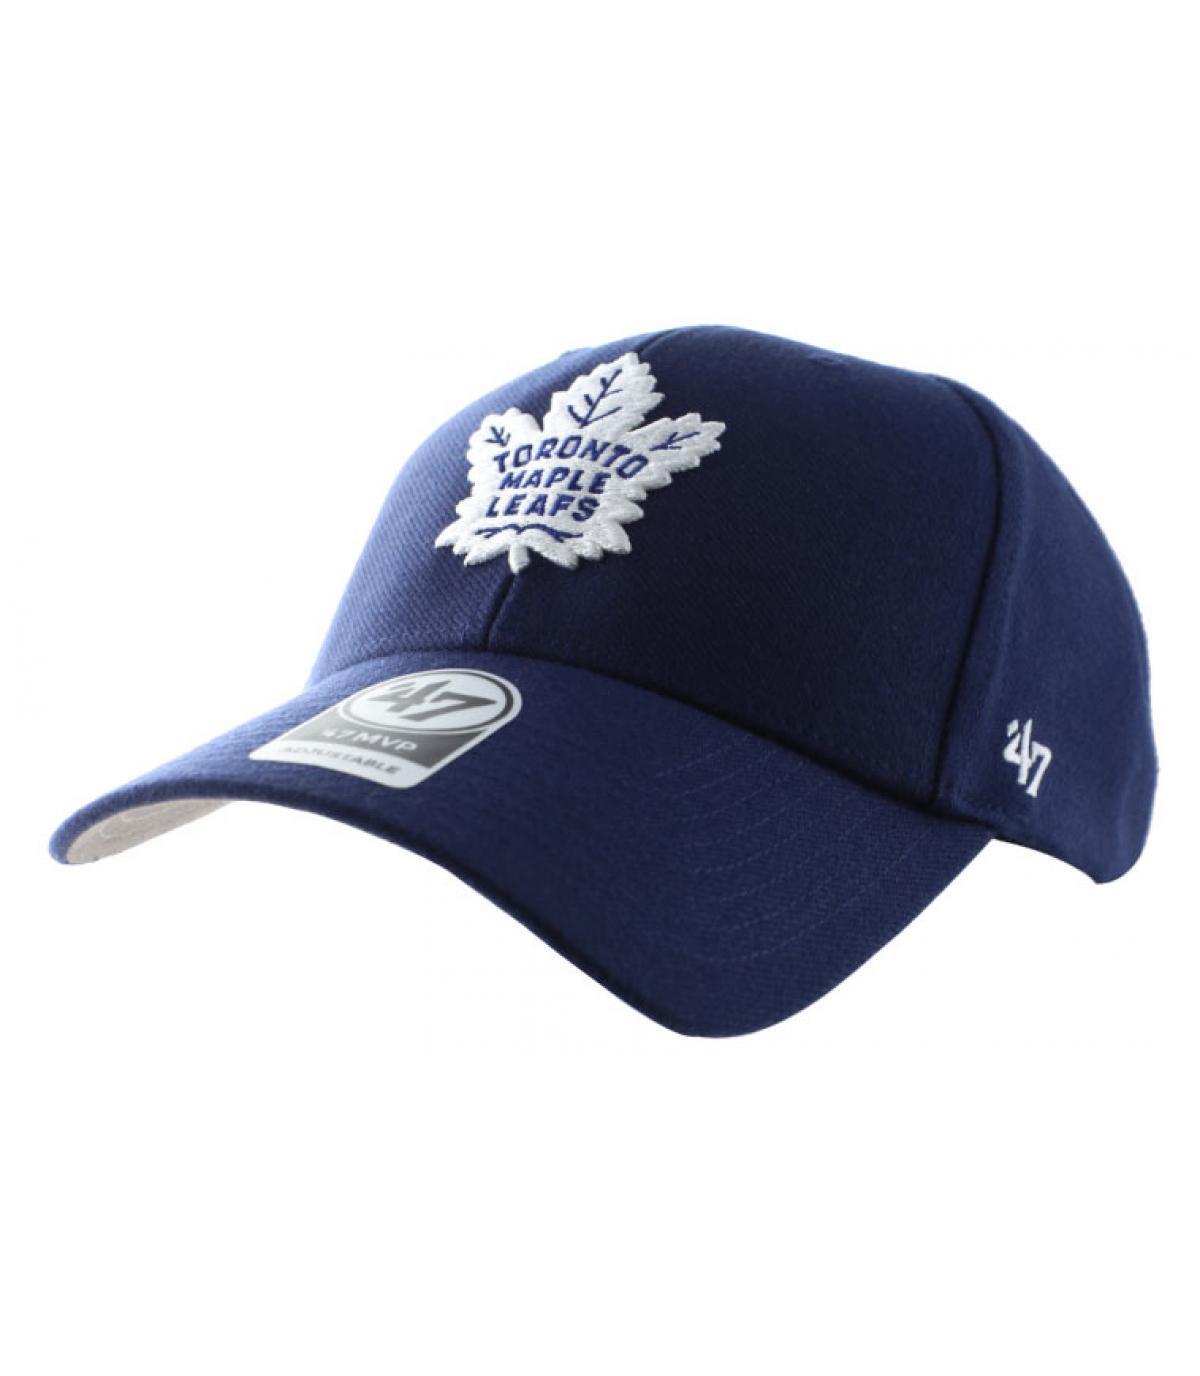 Détails MVP Toronto Maple Leafs light navy - image 2